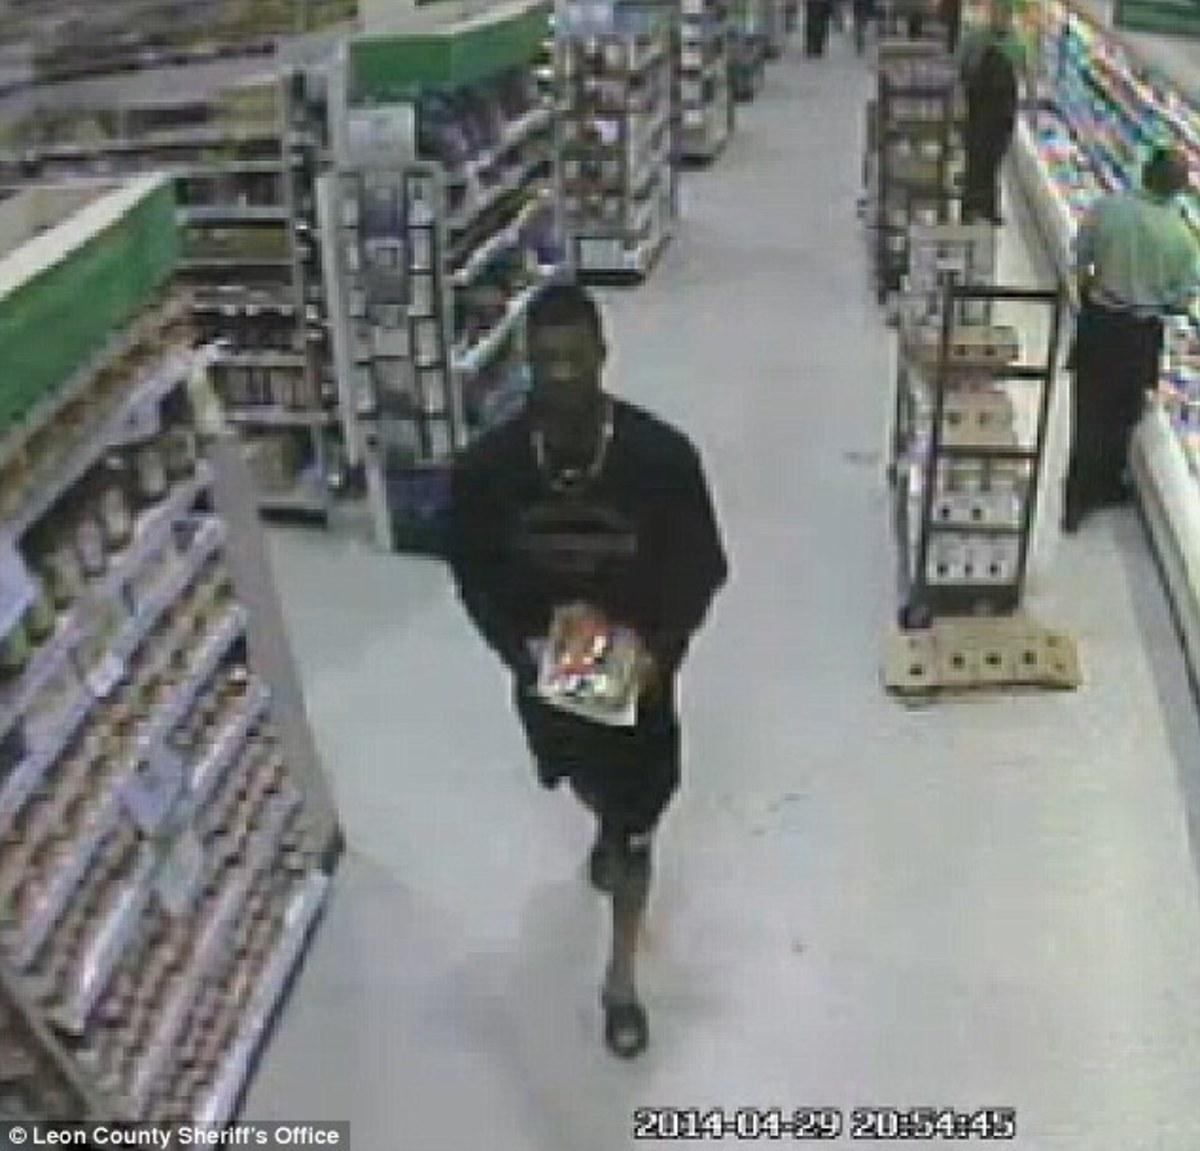 Jameis-Winston-surveillance-video.jpg